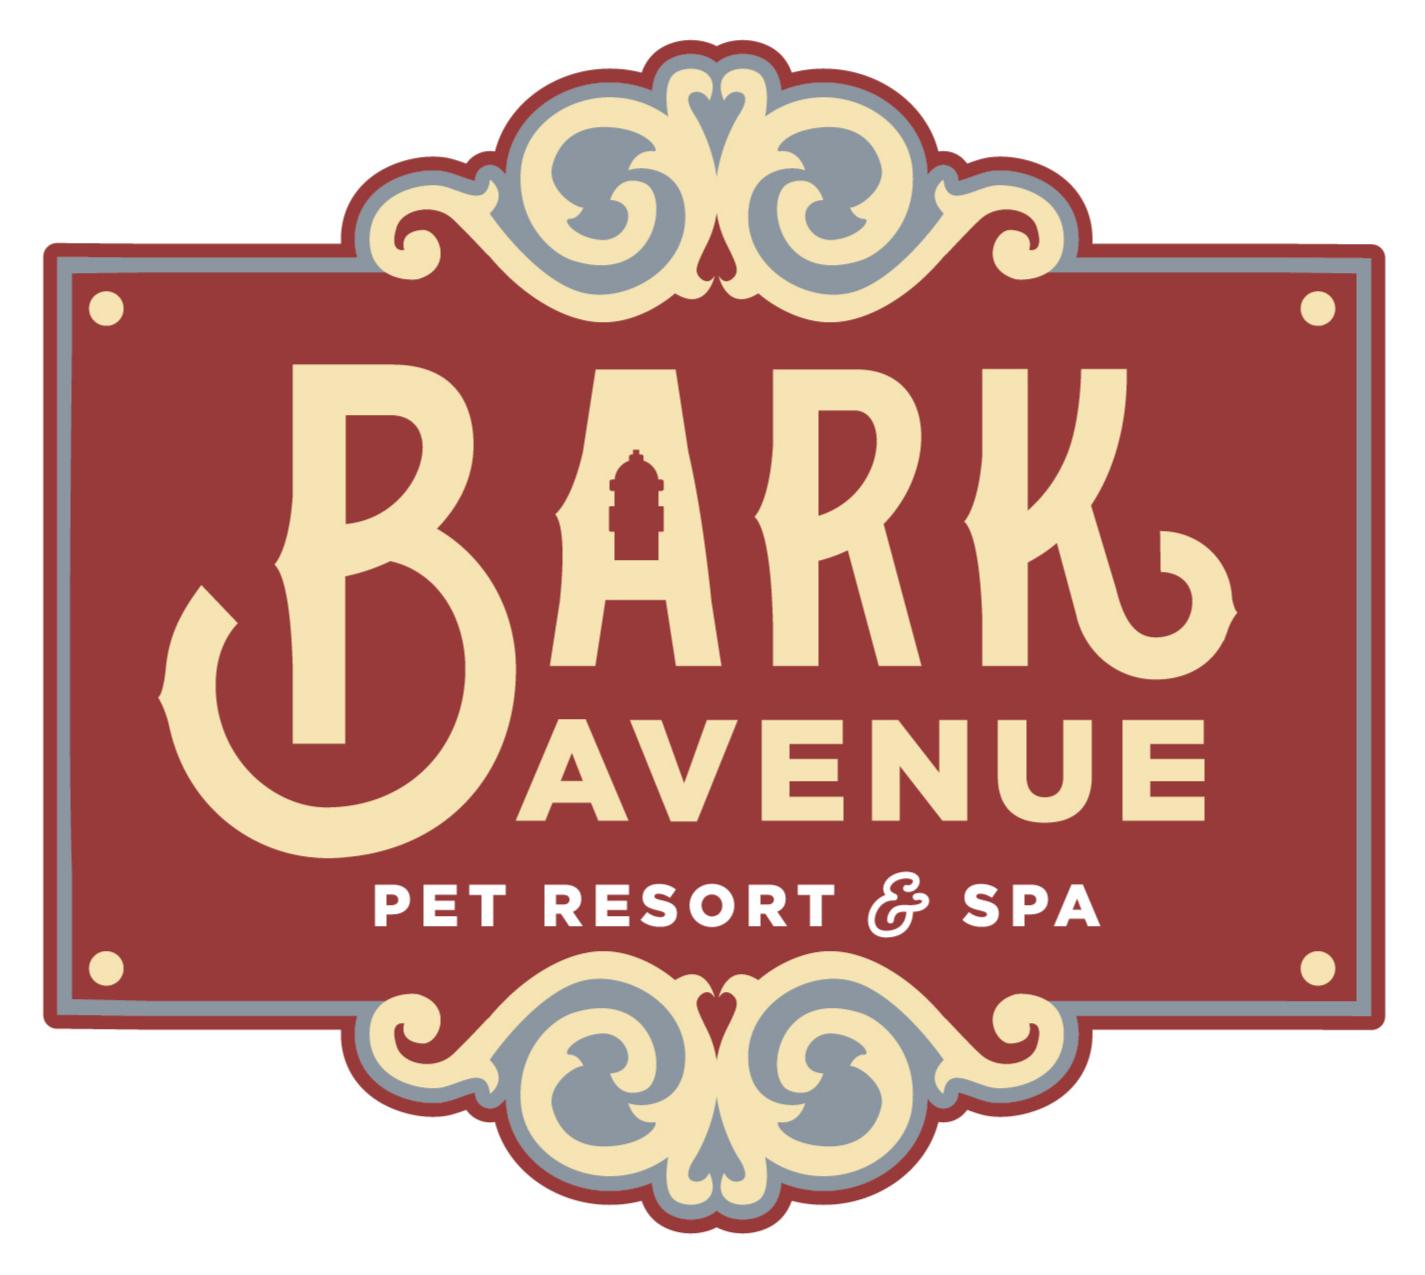 Bark Avenue Pet Resort and Spa